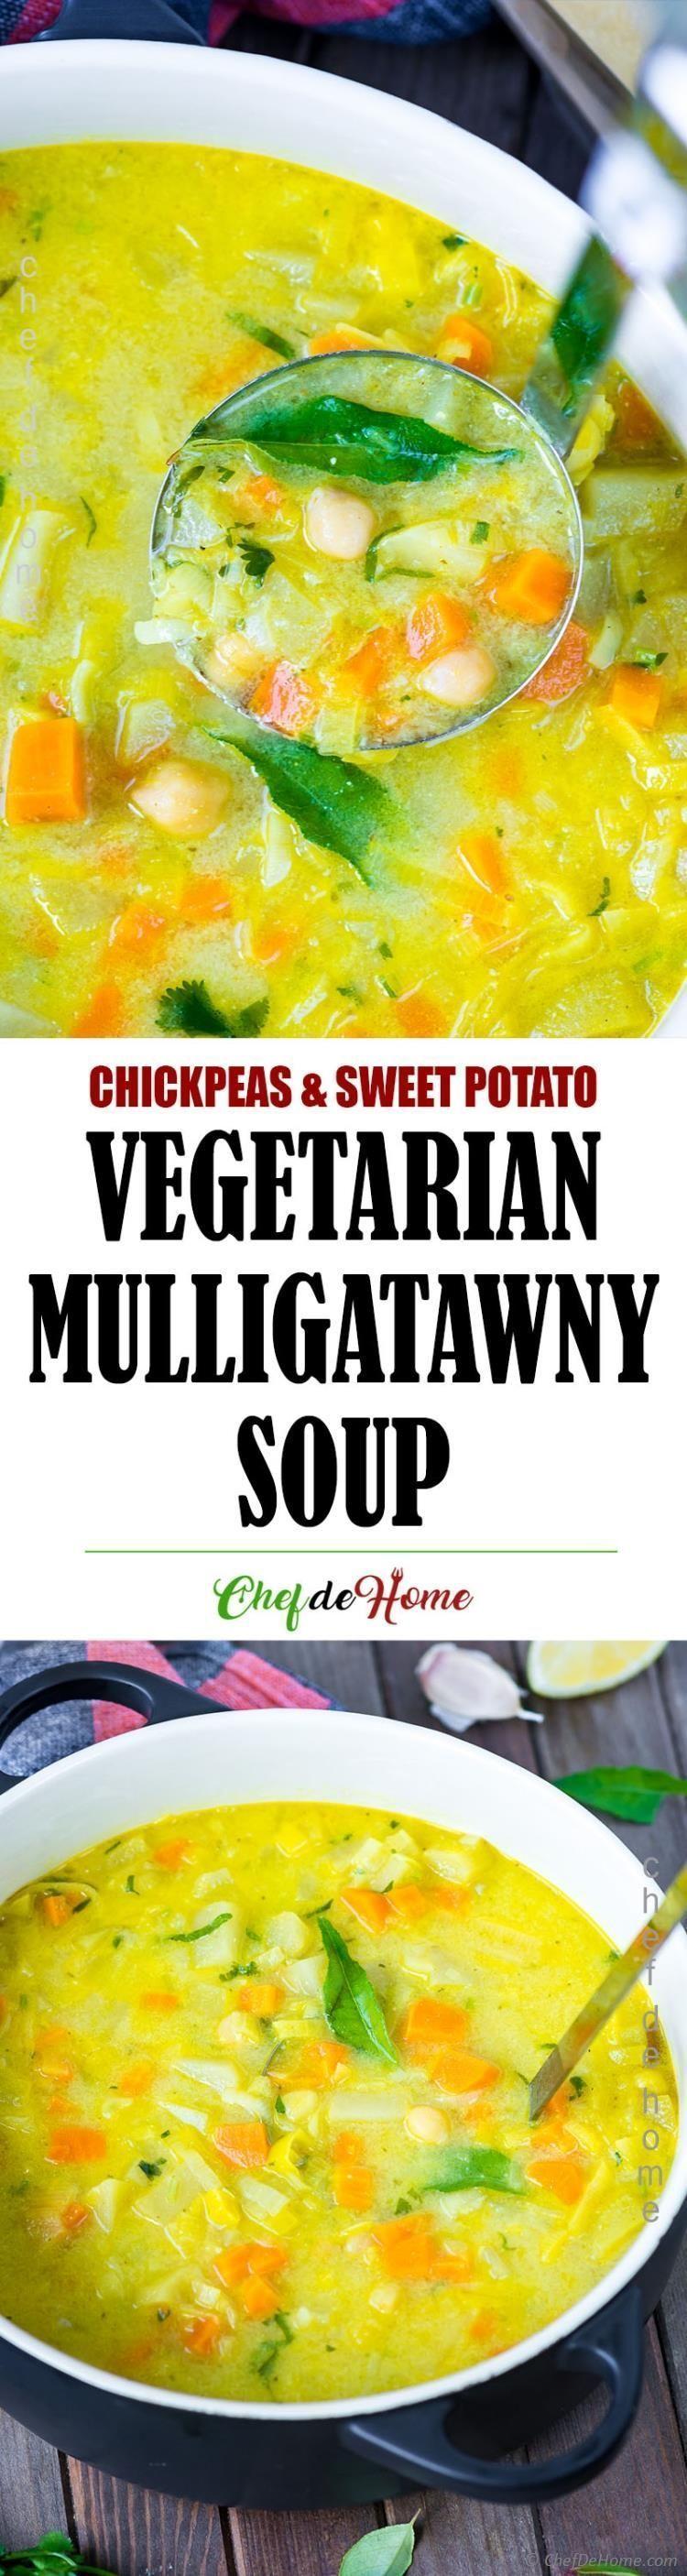 Vegetarian Mulligatawny Soup Recipe | ChefDeHome.com